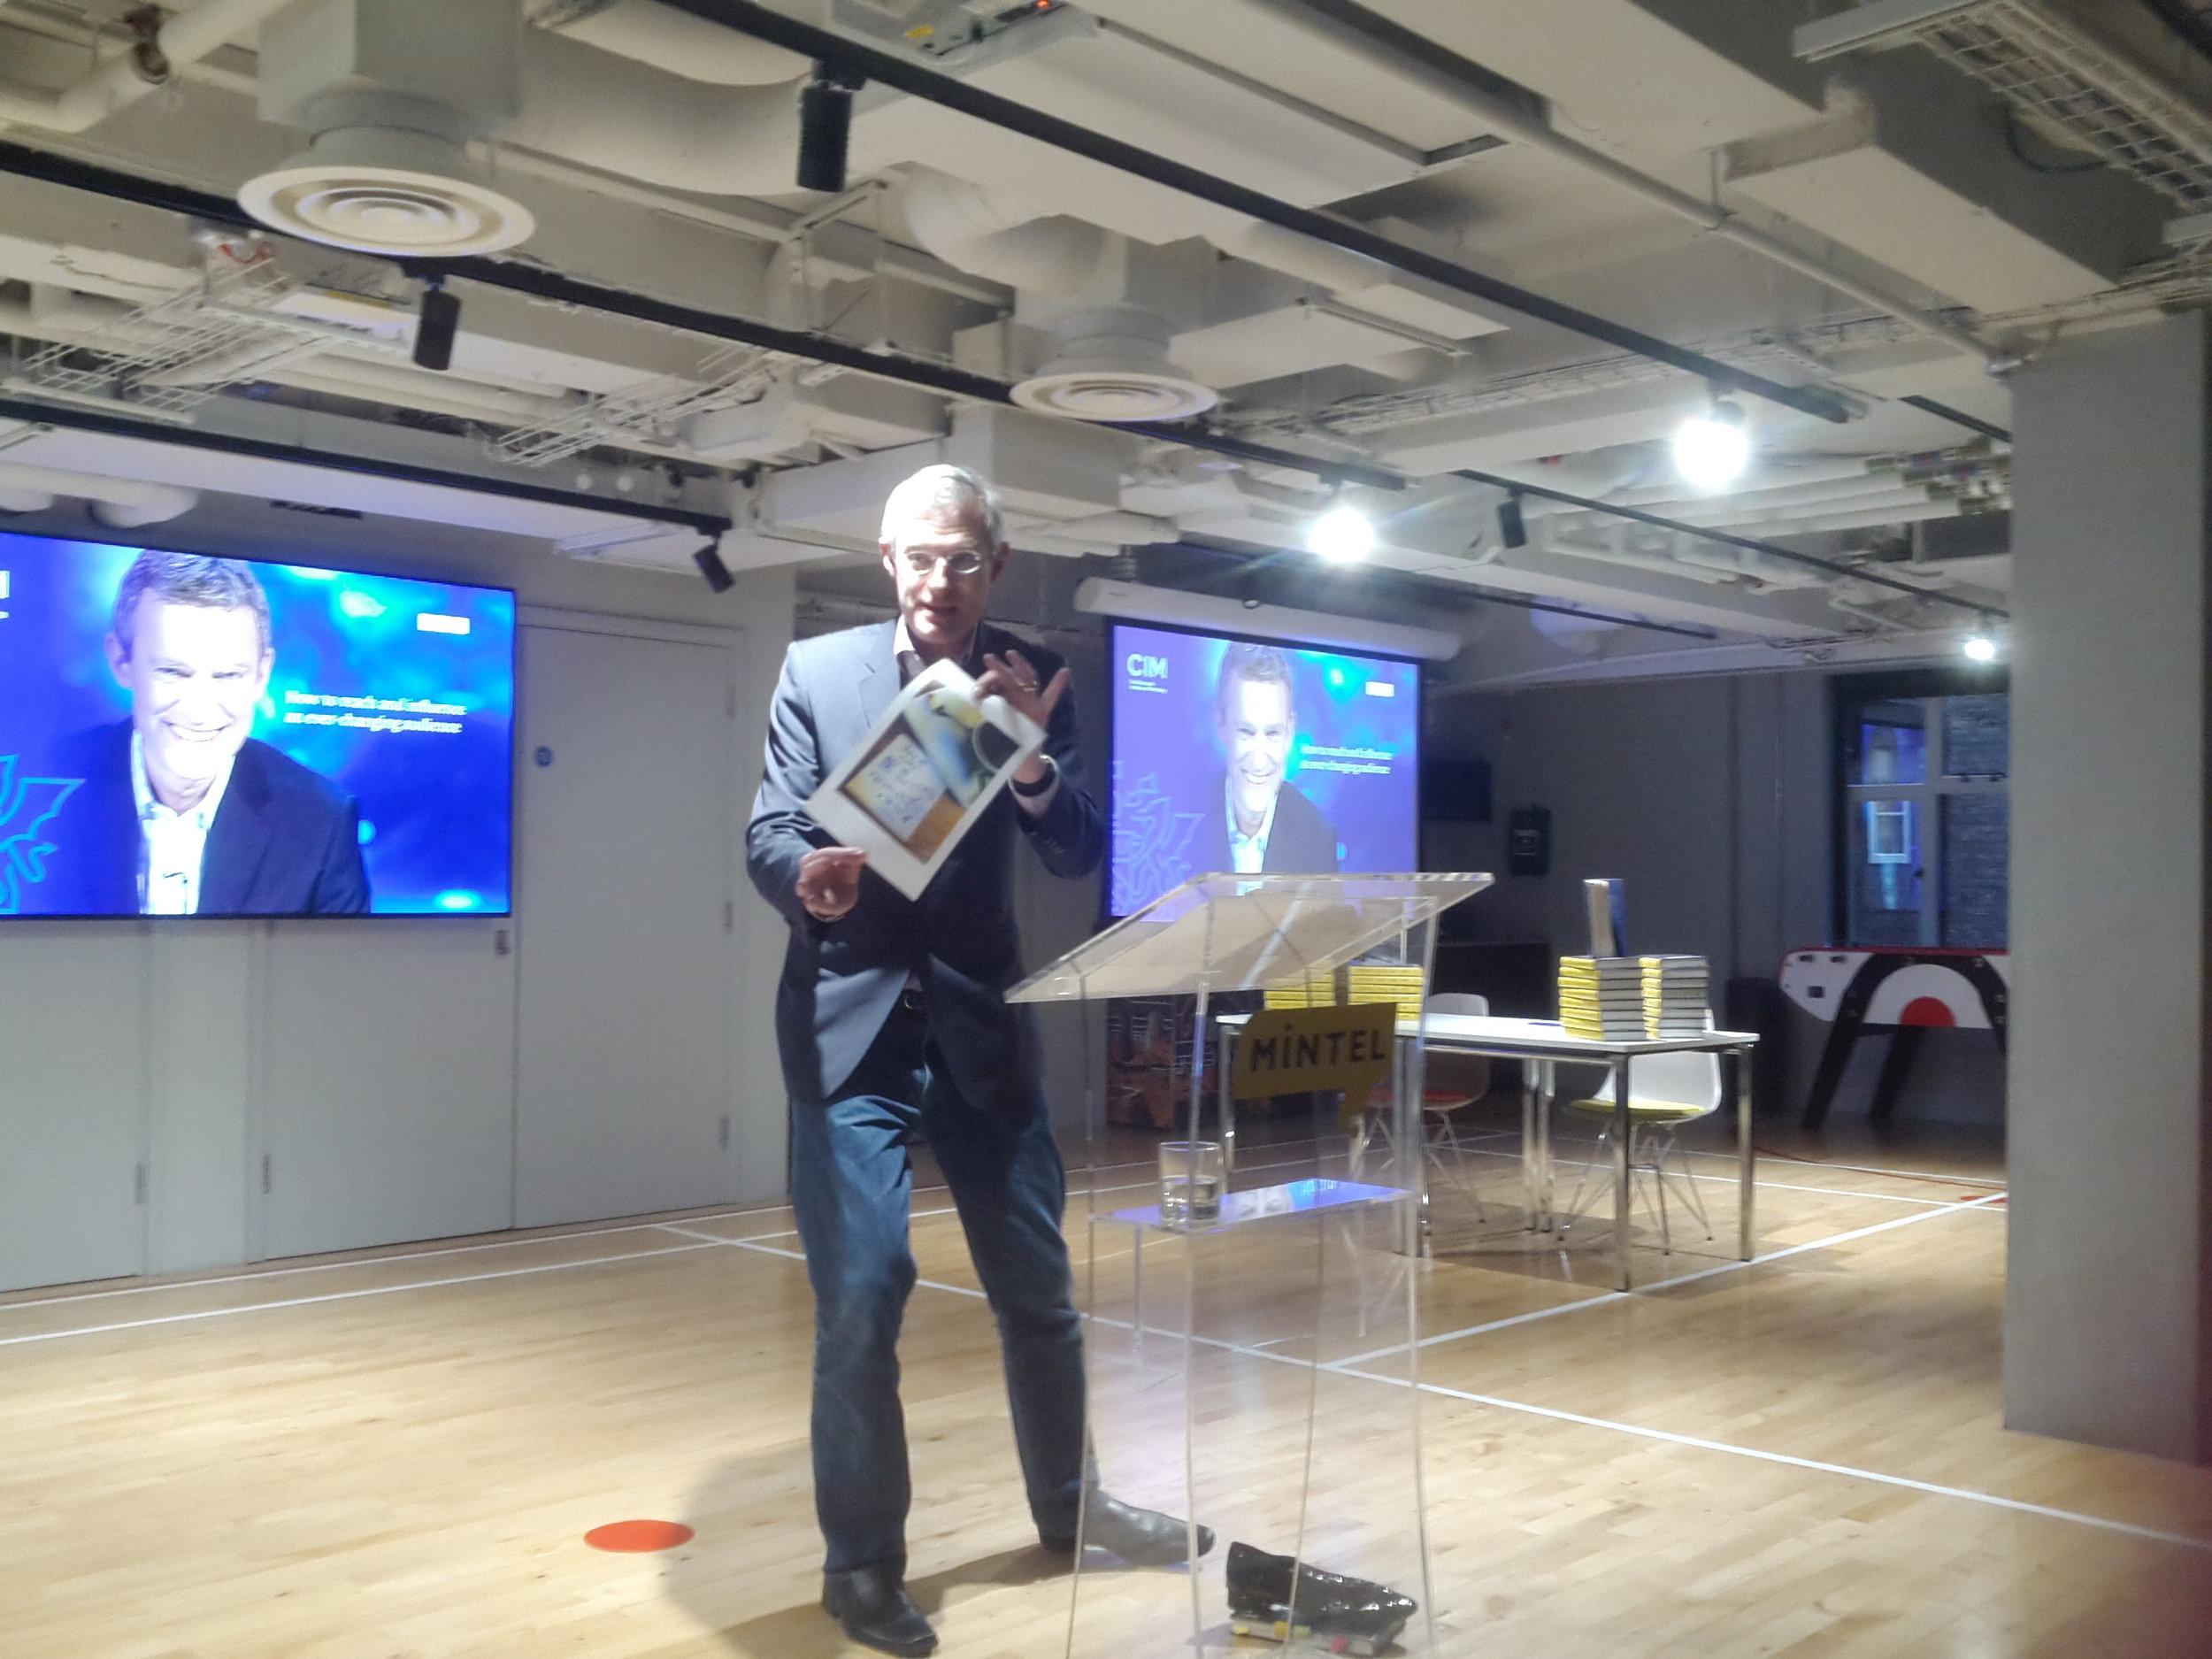 Jeremy Vine CIM event.jpg